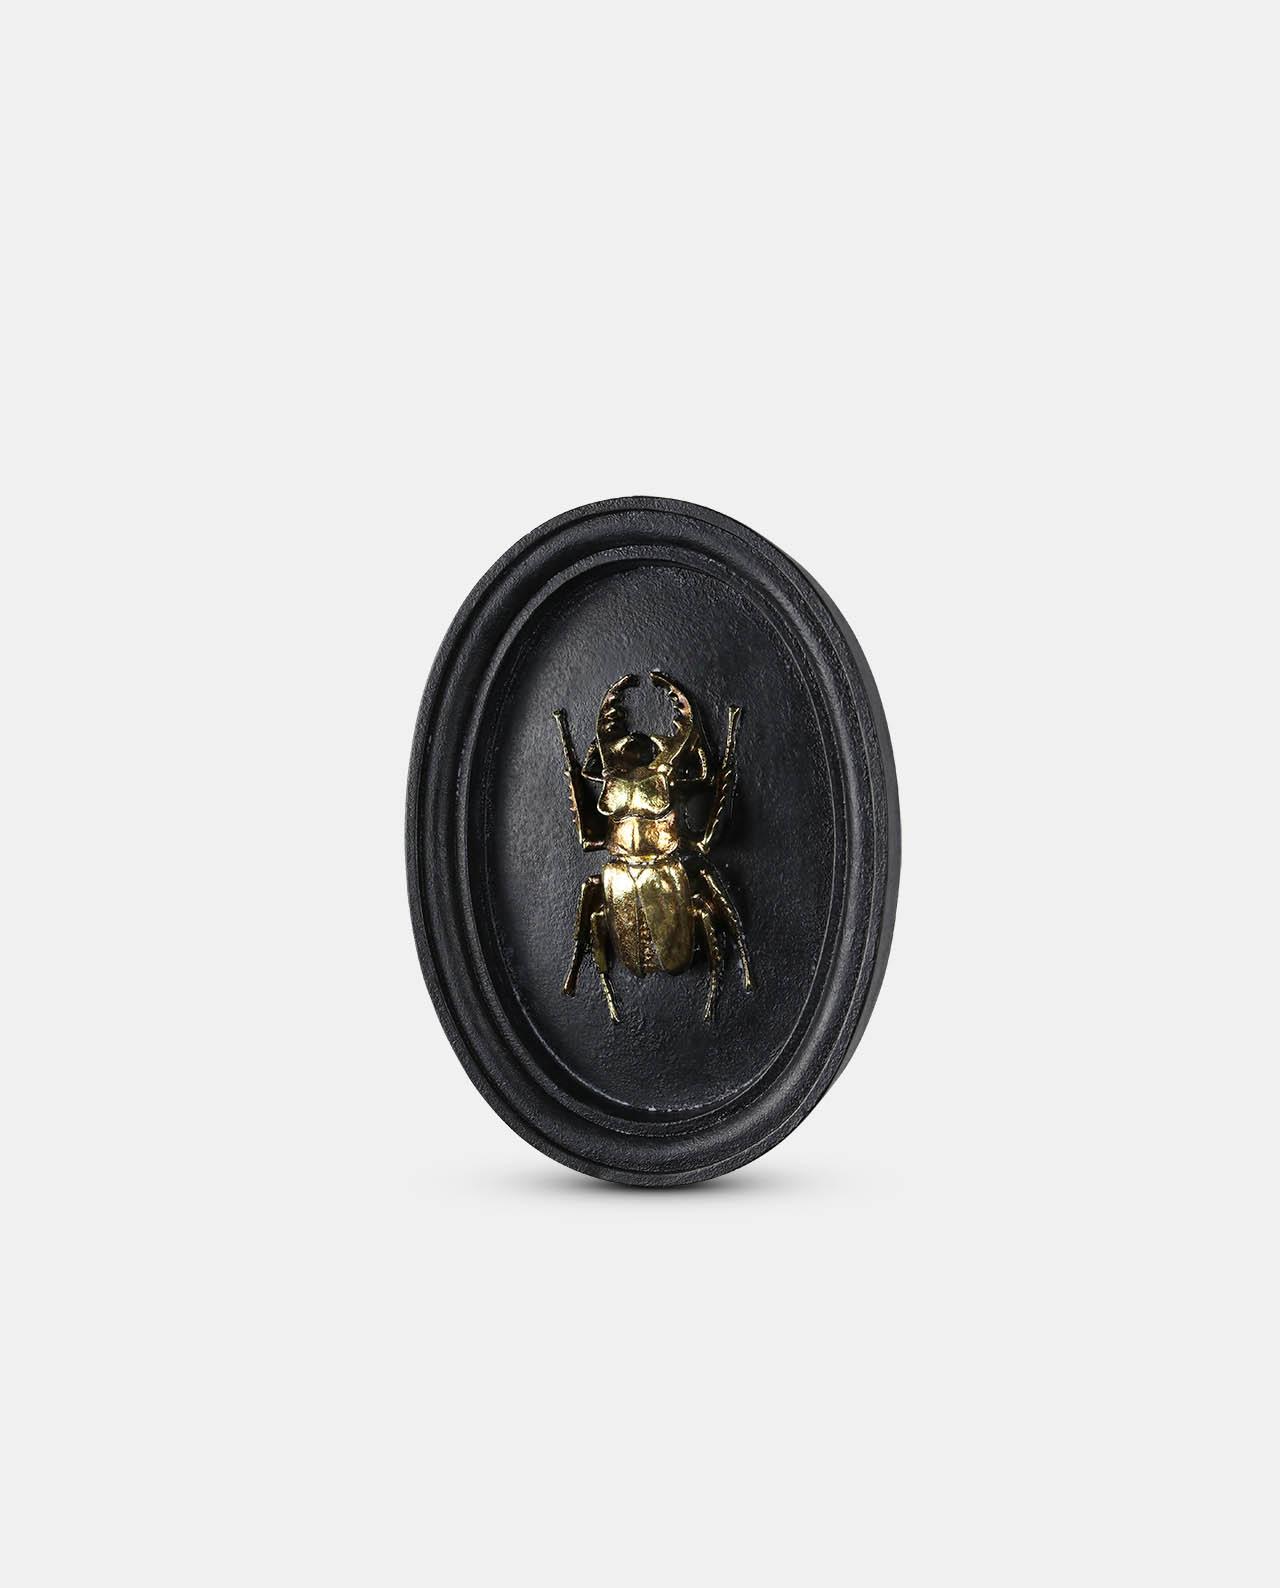 Beetle Plaque No2